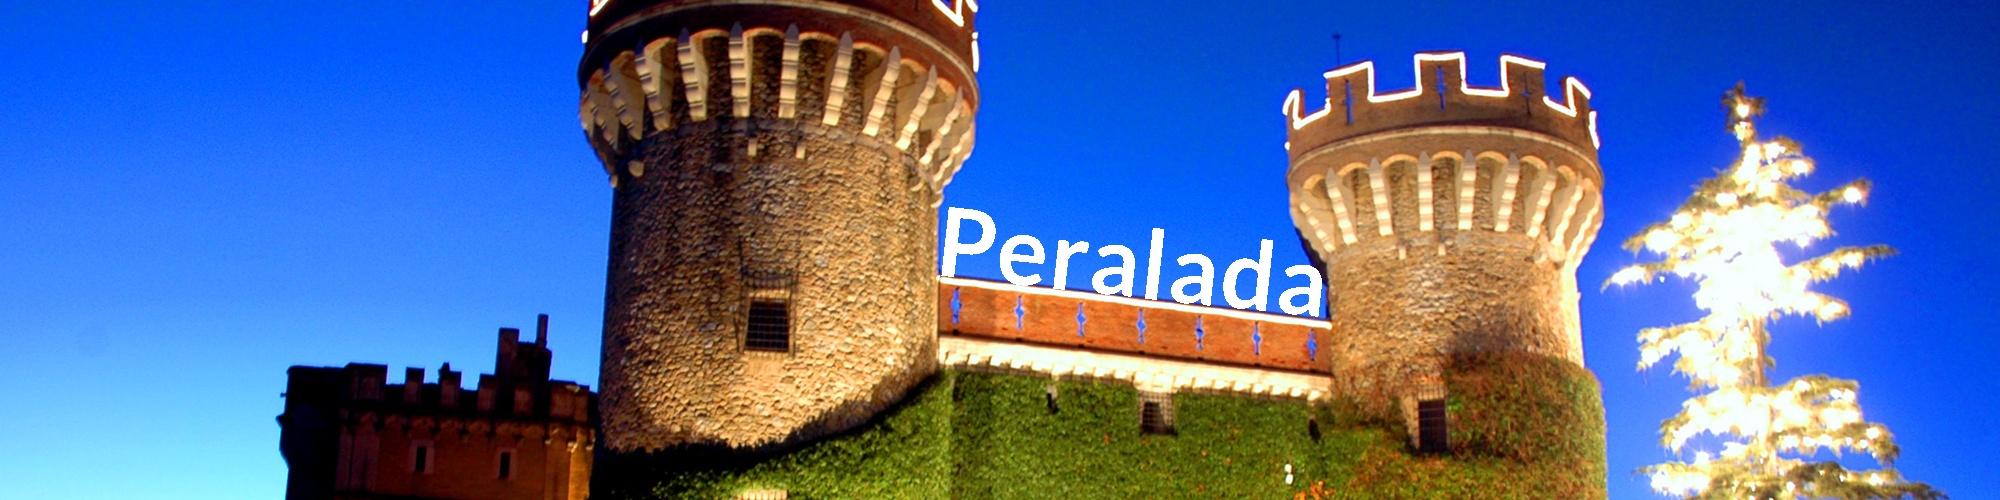 Houses for sale in Peralada, Girona, Costa Brava